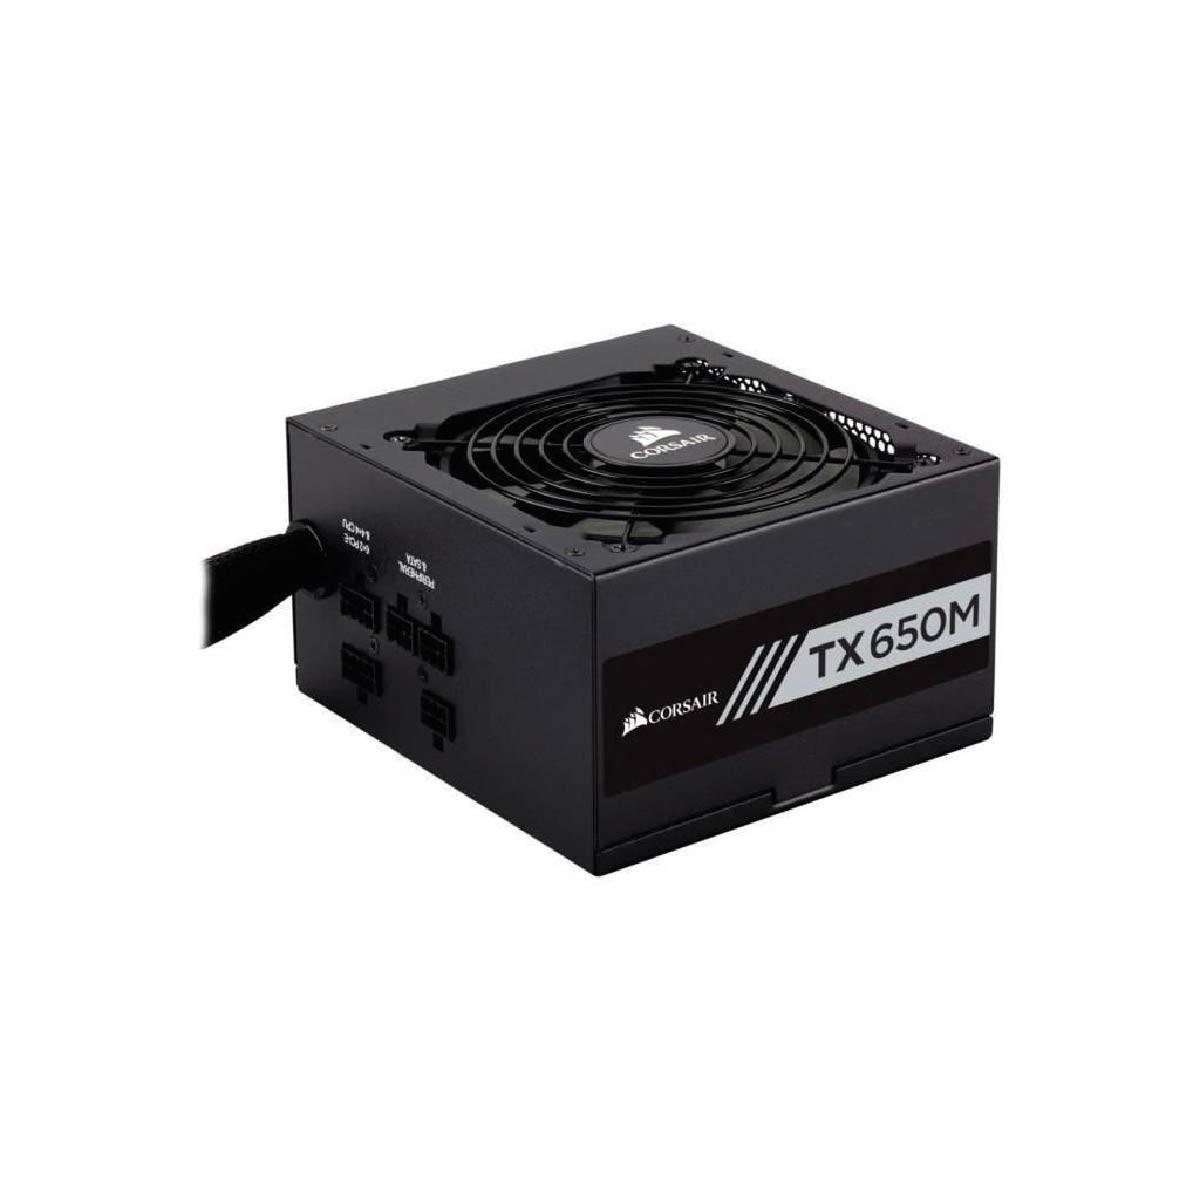 Fonte Corsair TX650M 650W ATX 80 Plus Ouro Semi Modular